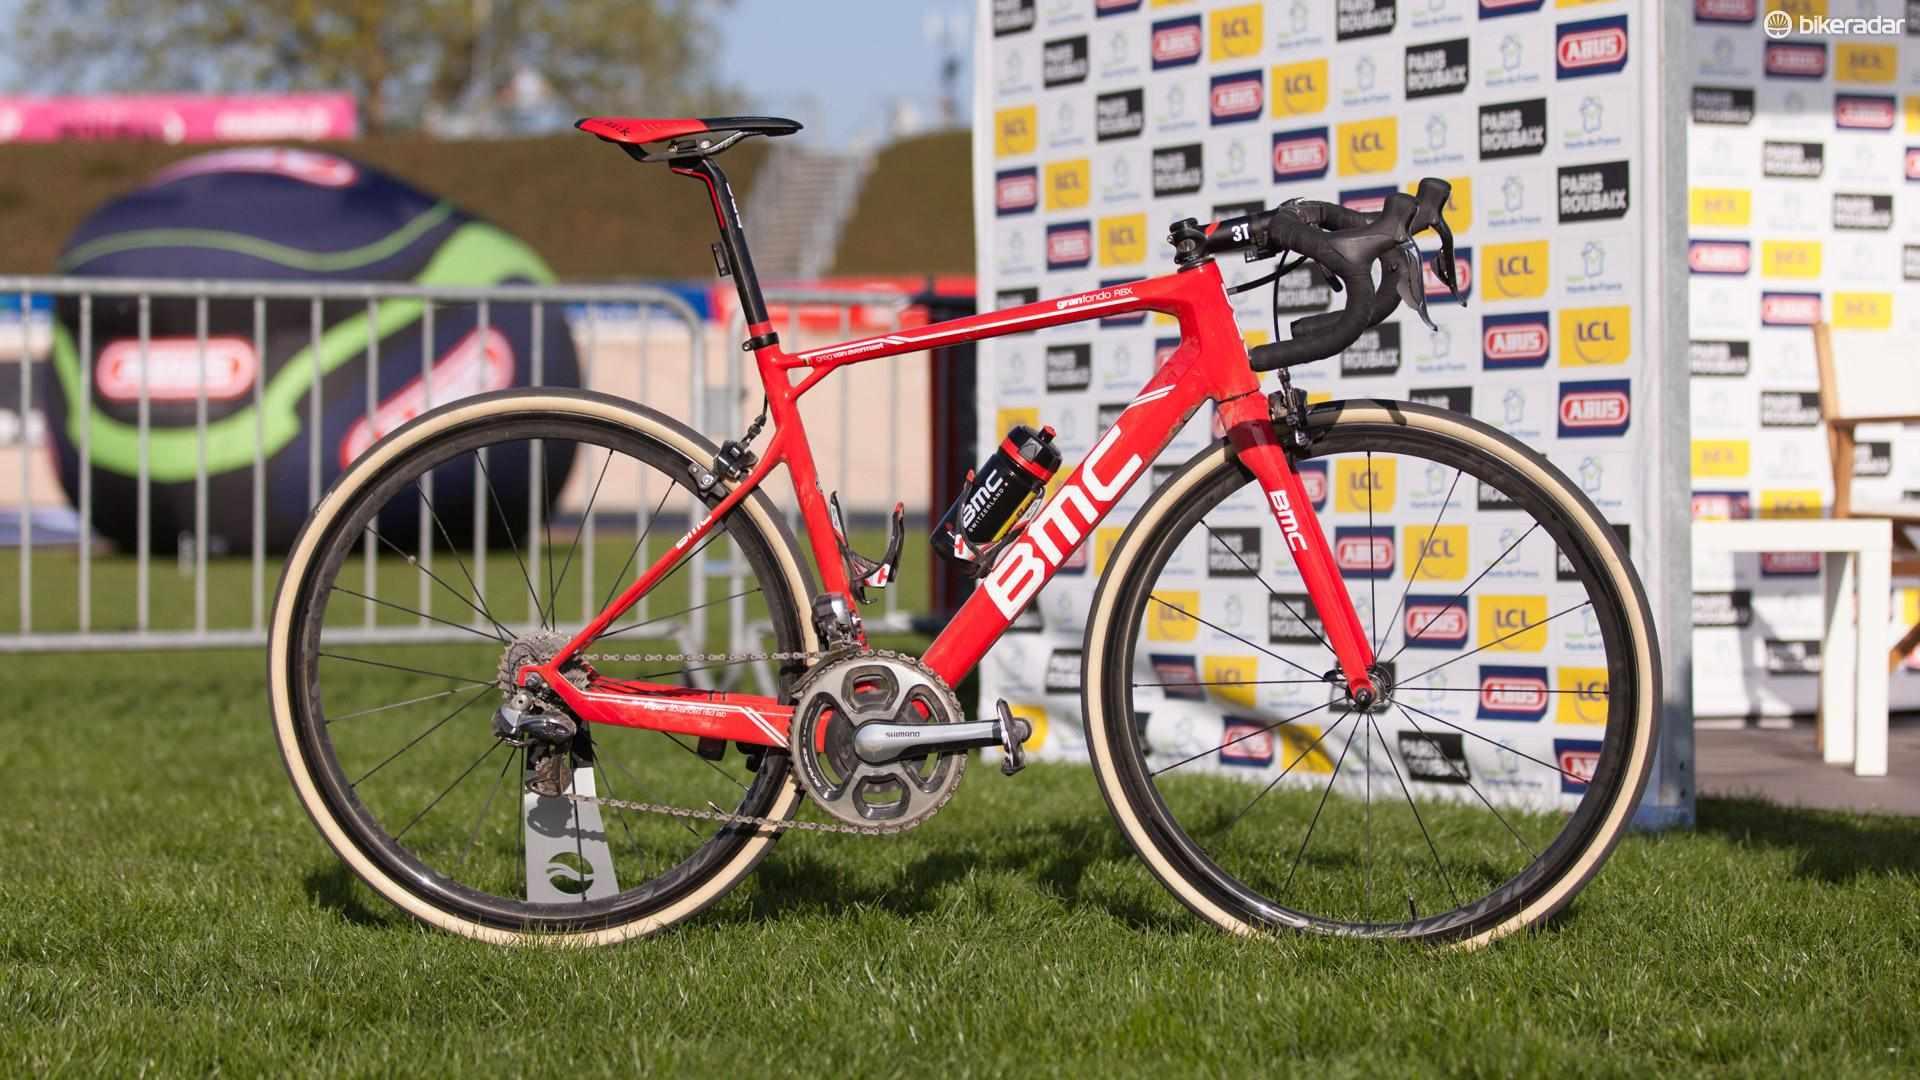 Greg Van Avermaet piloted his #2 BMC Granfondo RBX to victory inside the old Roubaix velodrome